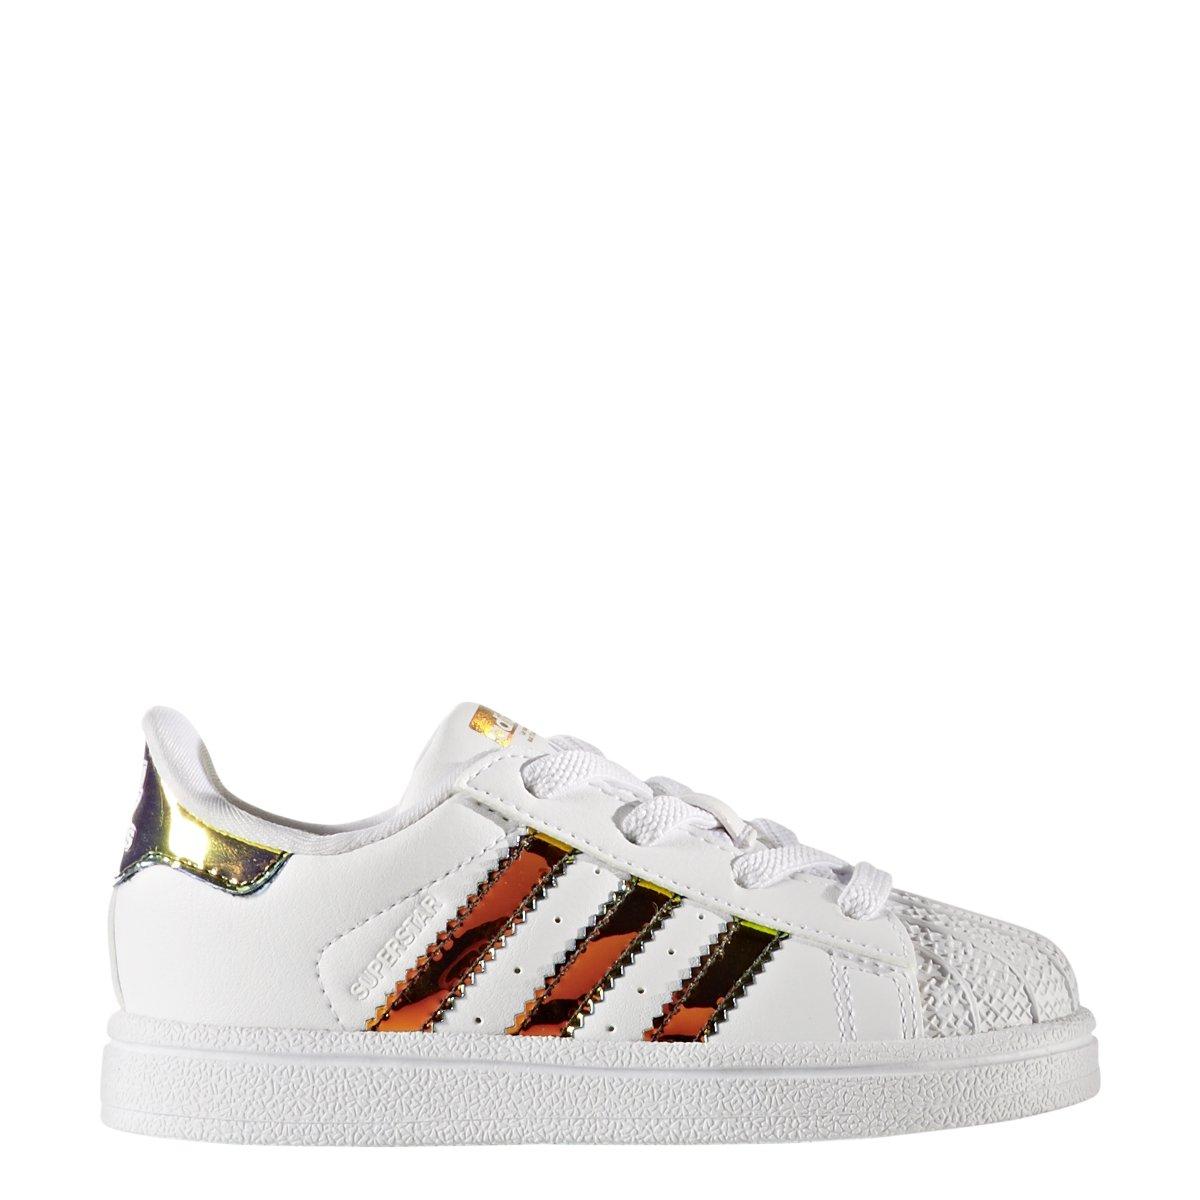 adidas Superstar EL I Toddler Cp9840 Size 10